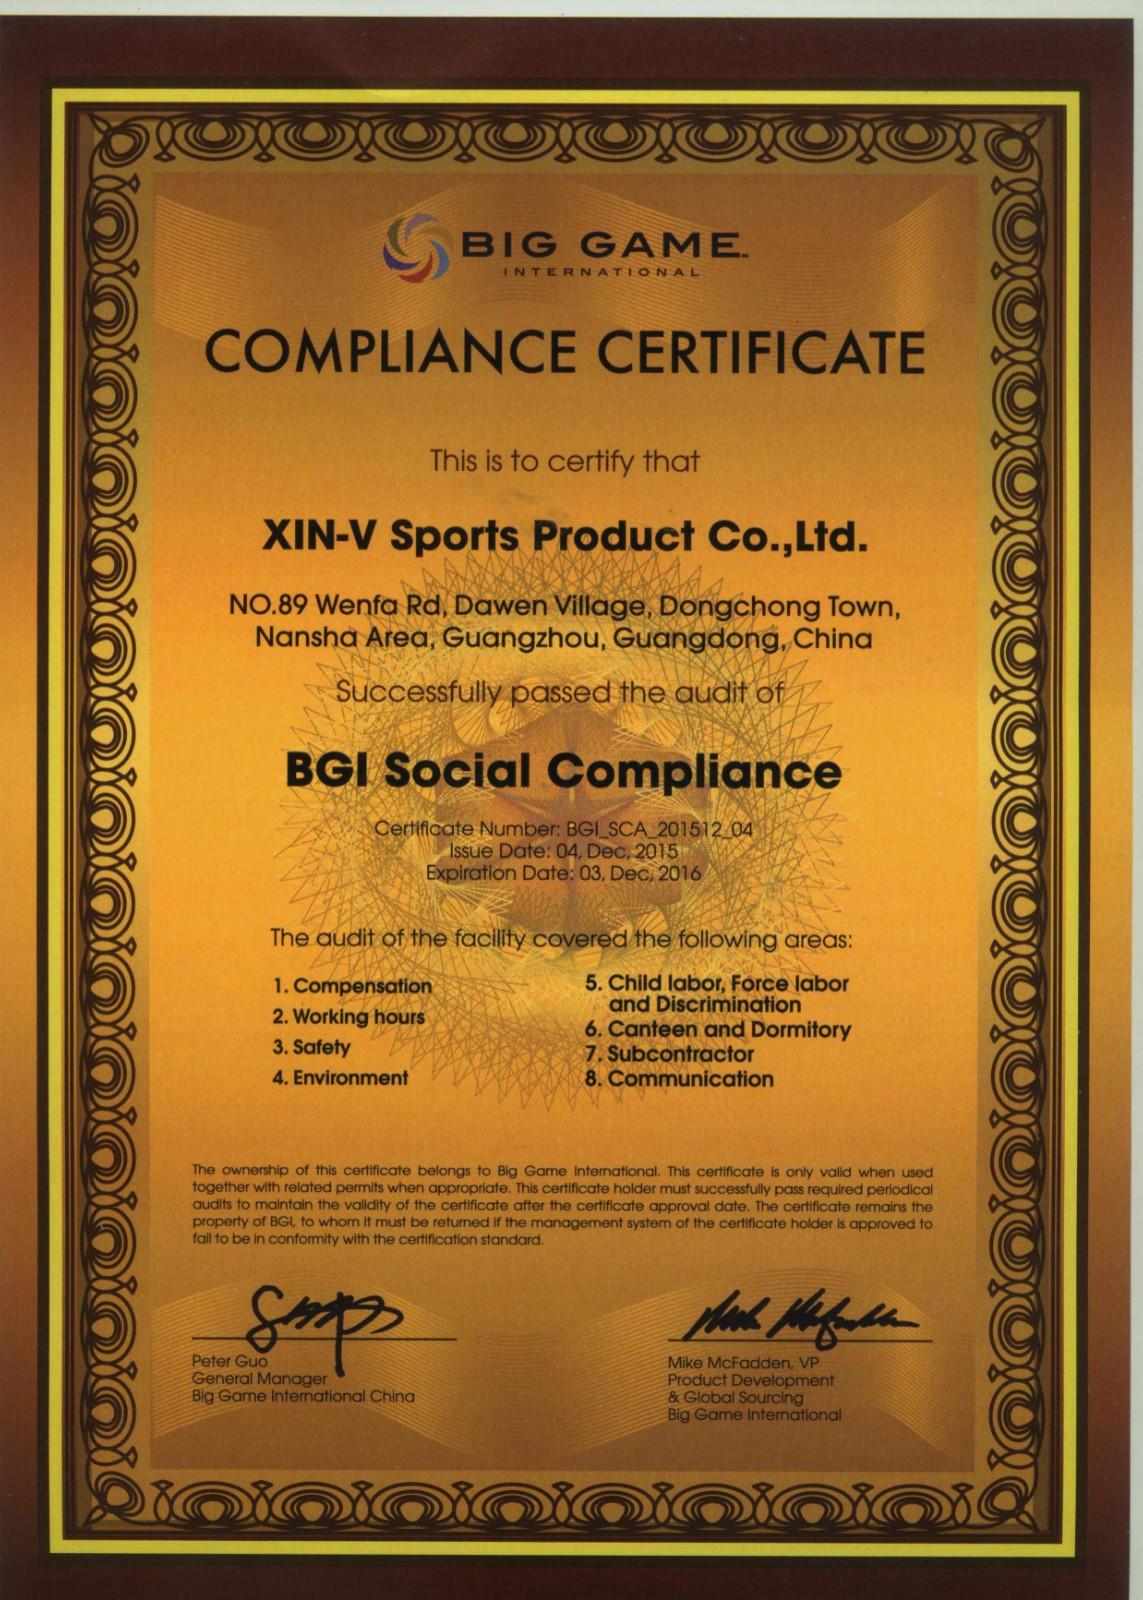 XIN-V -High-quality Soft Plastics For Bass | Xin-v Soft Lure Wma50 Free Sample 50mm 1-3